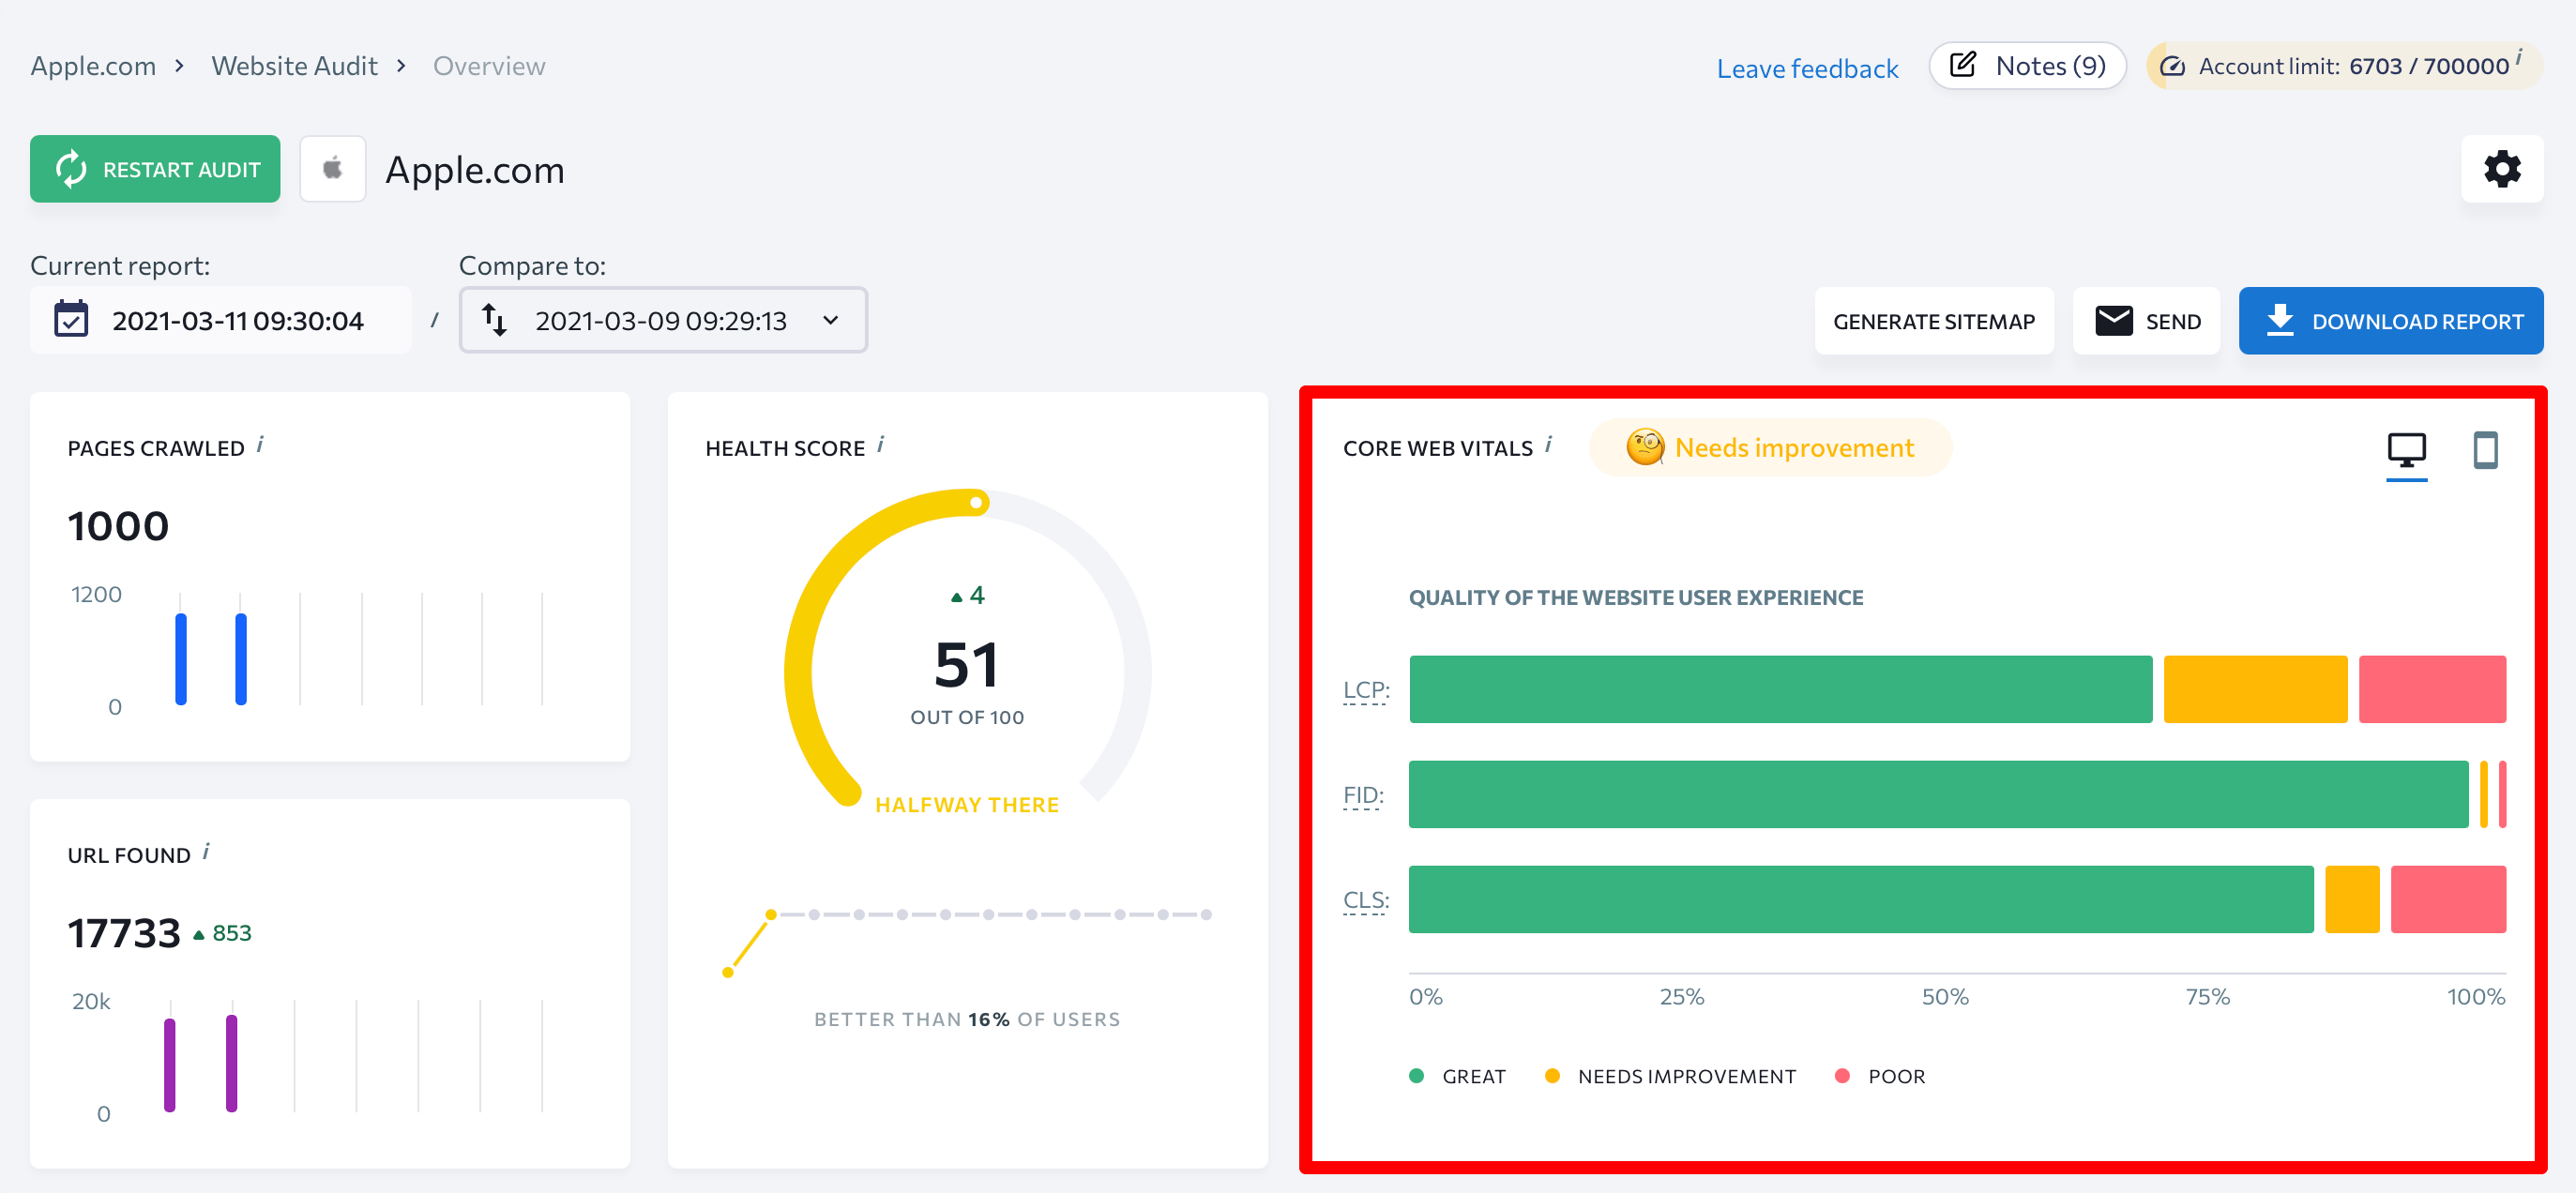 Core Web Vitals report in Website Audit